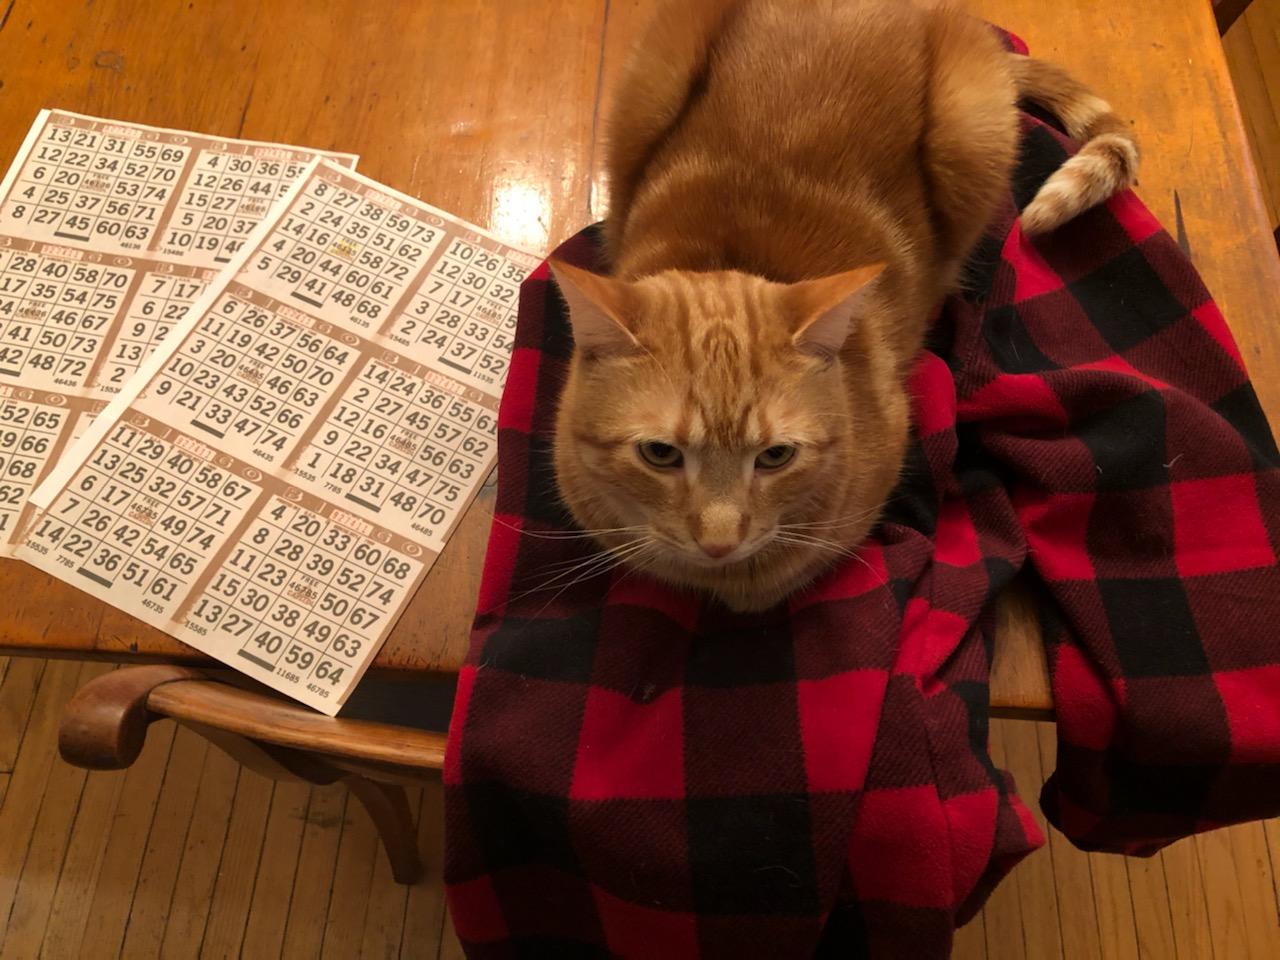 Marv the cat, getting ready to play Radio Bingo.